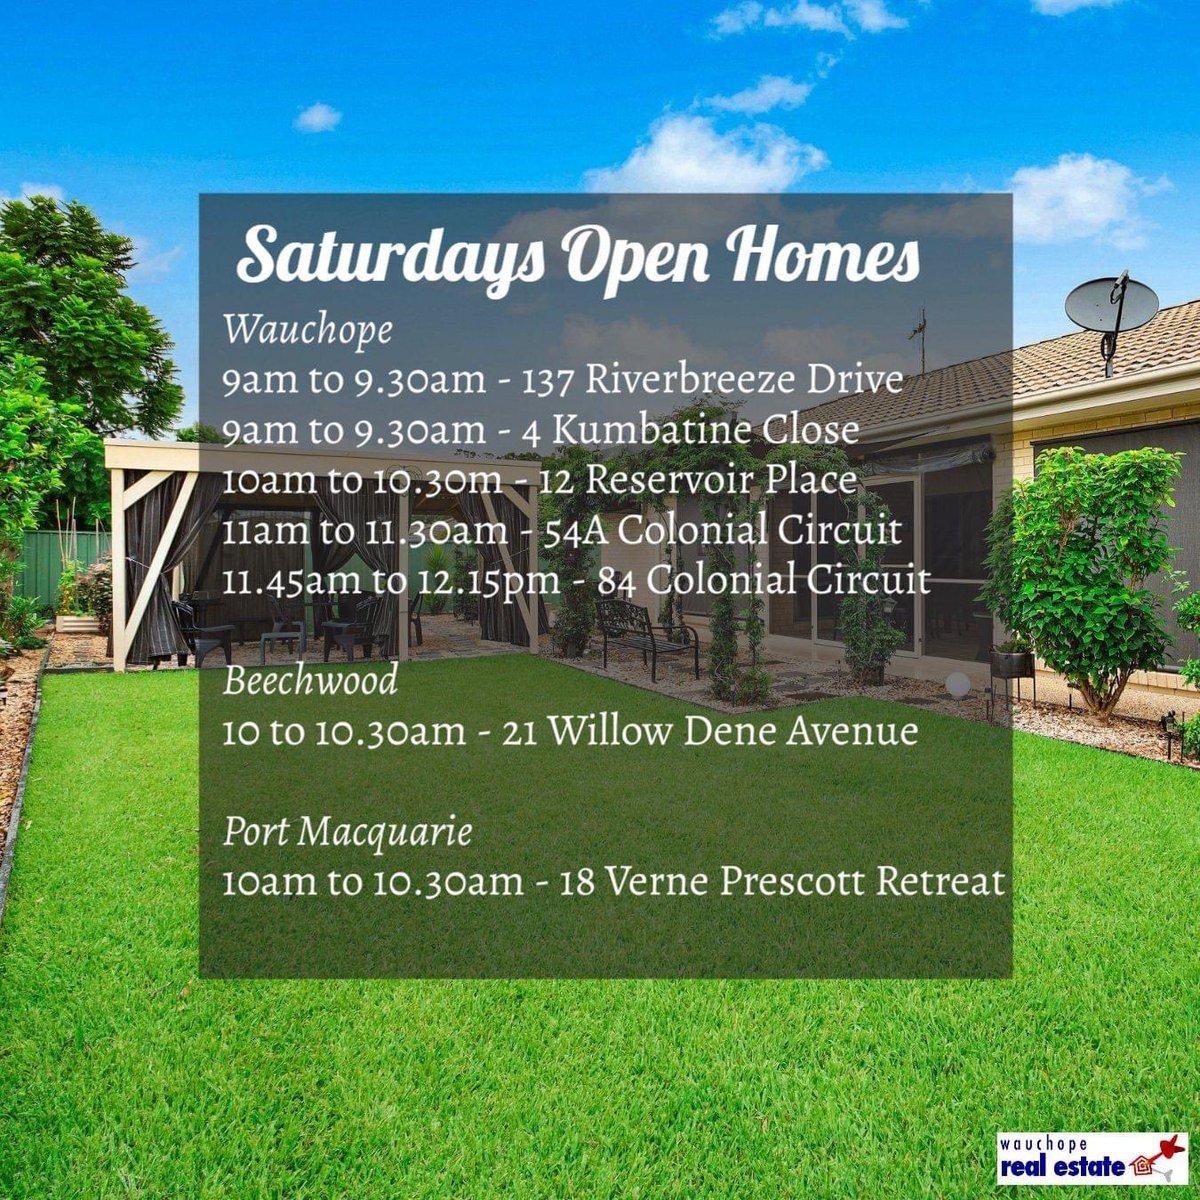 Saturday open homes 🏘    #openhomes #saturday #inspection #realestate #wauchope #portmacquarie #beechwood #forsale #wauchoperealestate #kirstieshawwre